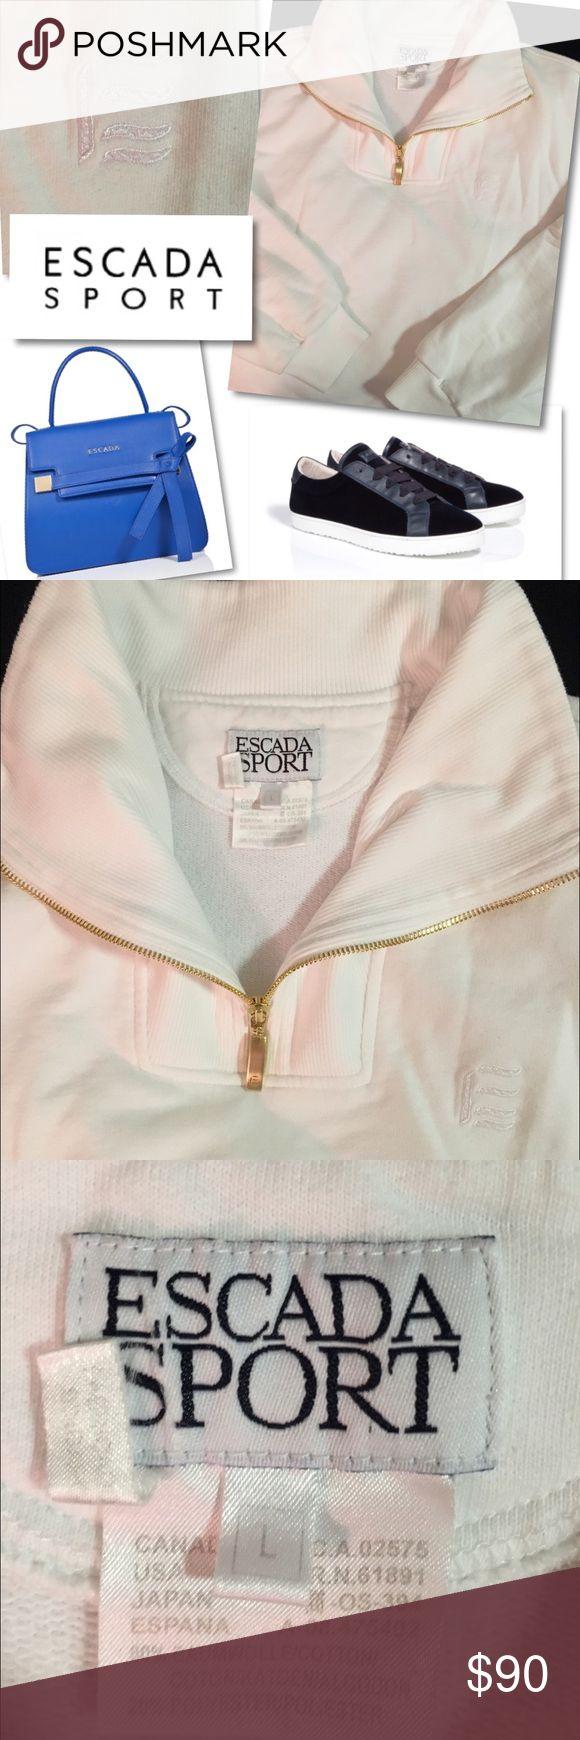 "ESCADA SPORT WHITE 1/2 ZIP JACKET TOP PULLOVER L ESCADA SPORT  WHITE 1/2 ZIP JACKET TOP PULLOVER  SZ L  46"" BUST 27"" LENGTH COTTON / POLYESTER RETAILS $575 Escada Jackets & Coats"